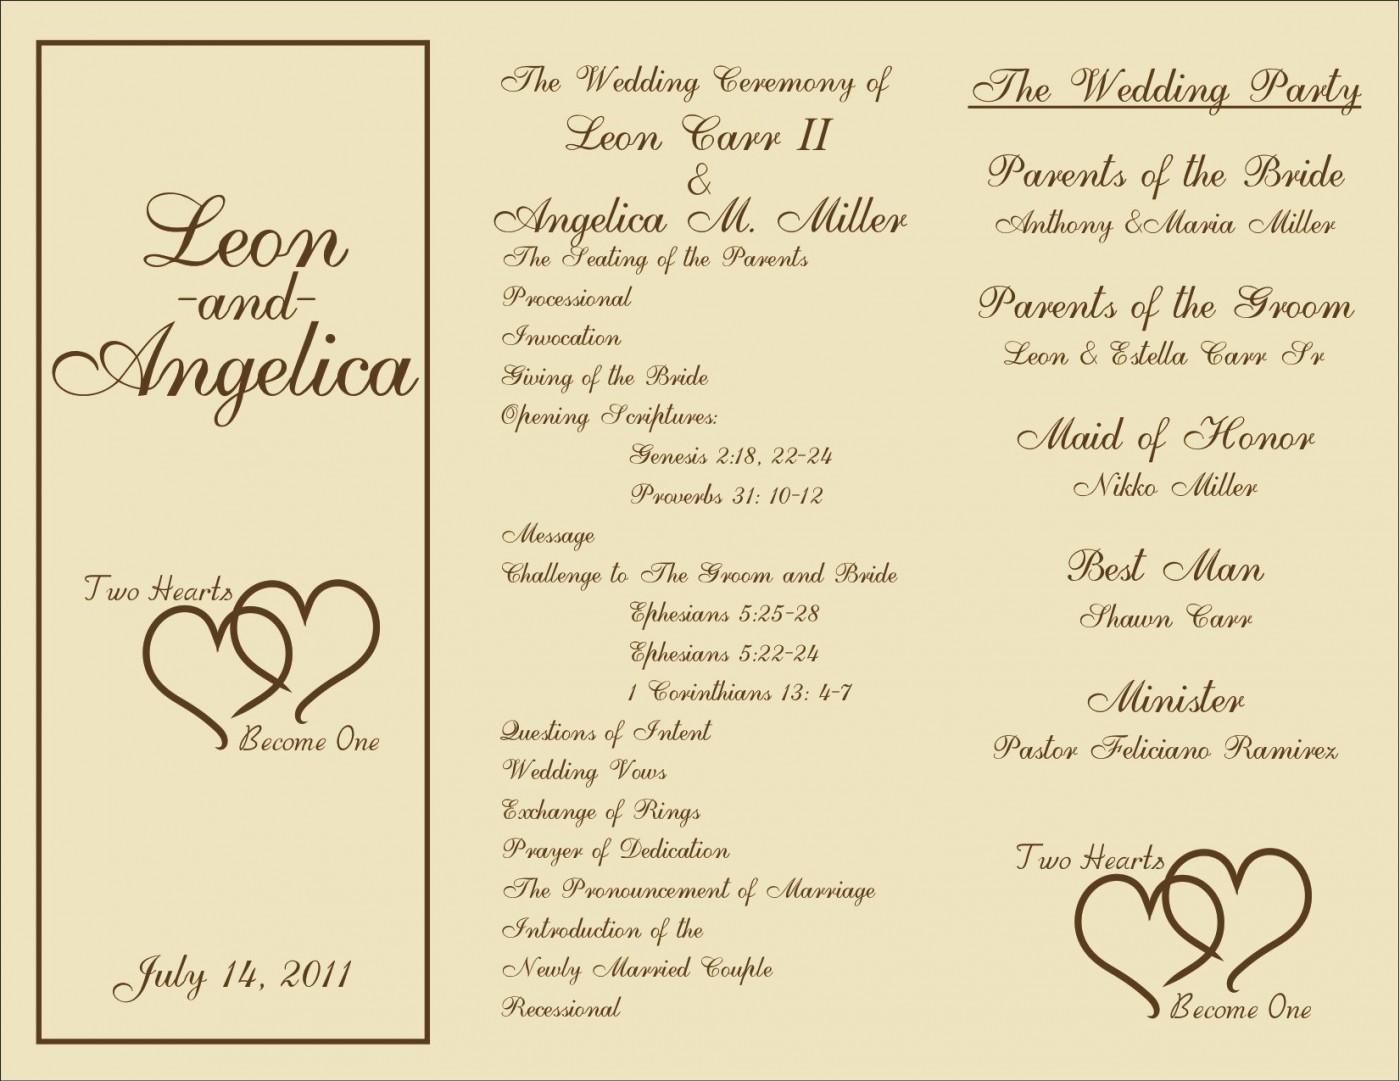 005 Marvelou Free Template For Wedding Ceremony Program Concept 1400